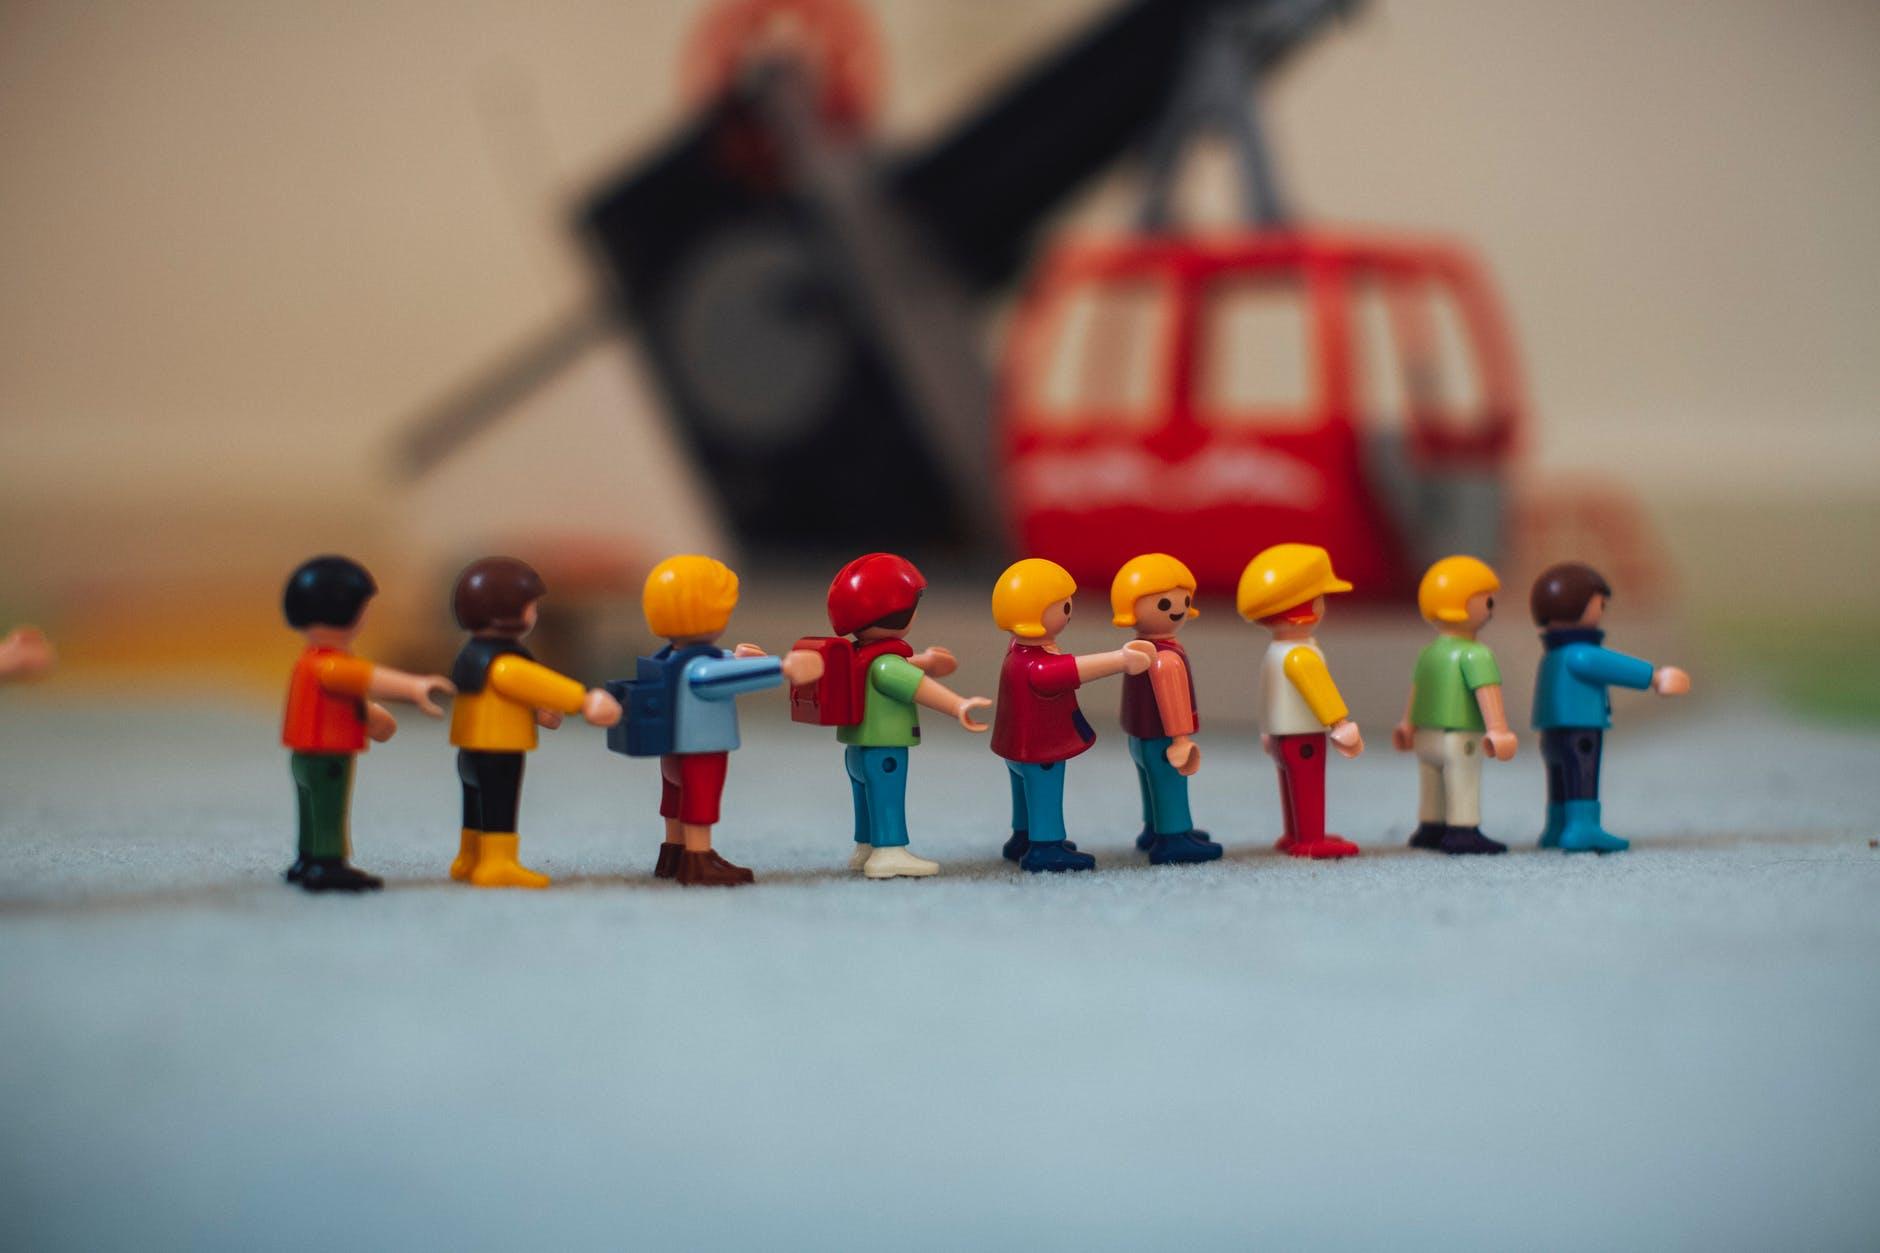 photo of lego toy miniatures